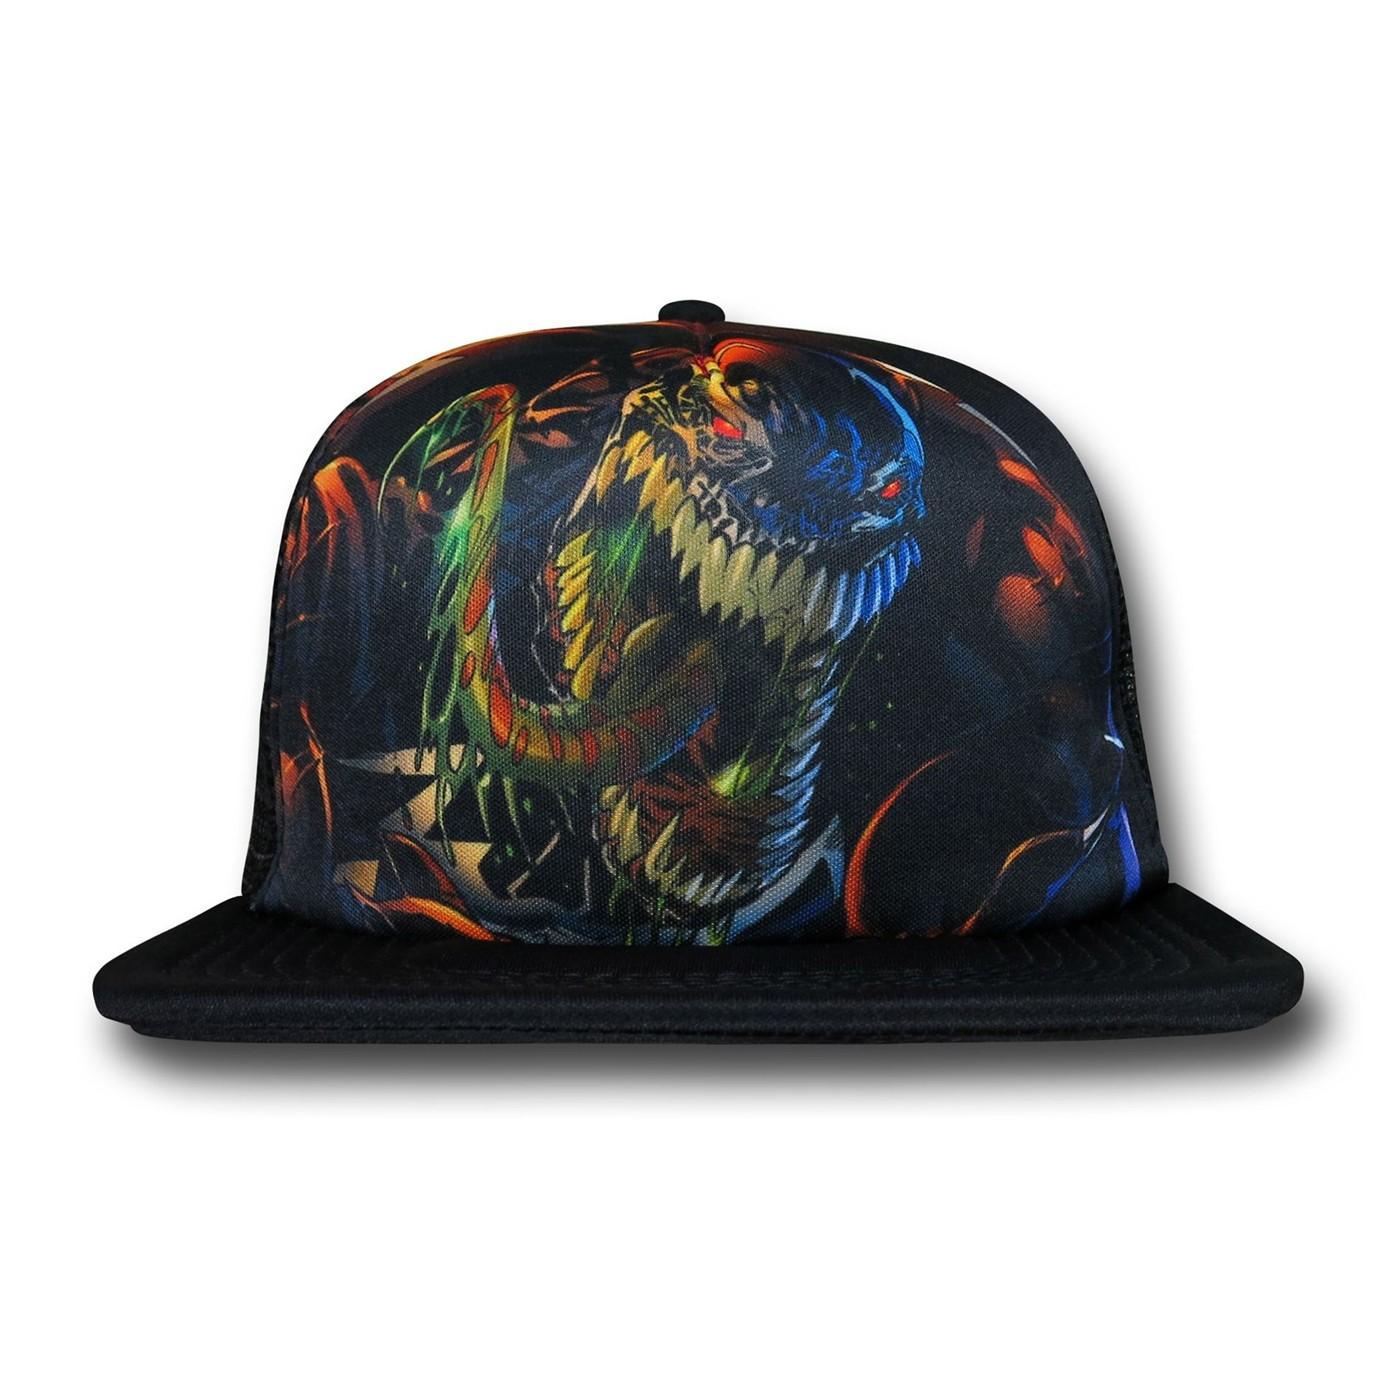 Venom Sublimated Trucker Hat